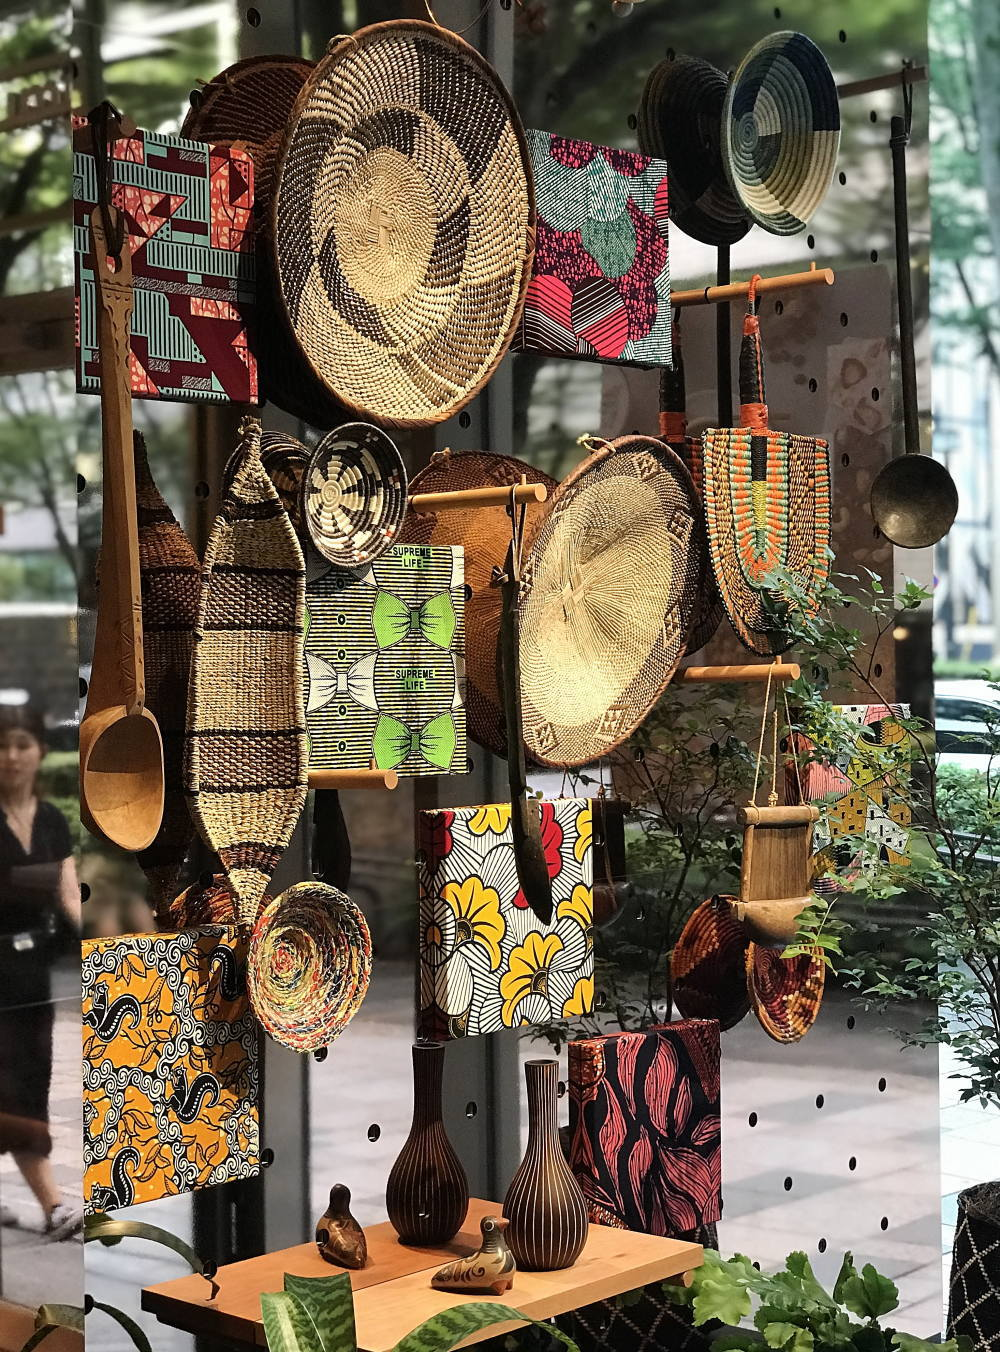 imperfect表参道 カカオの国の民芸品展示